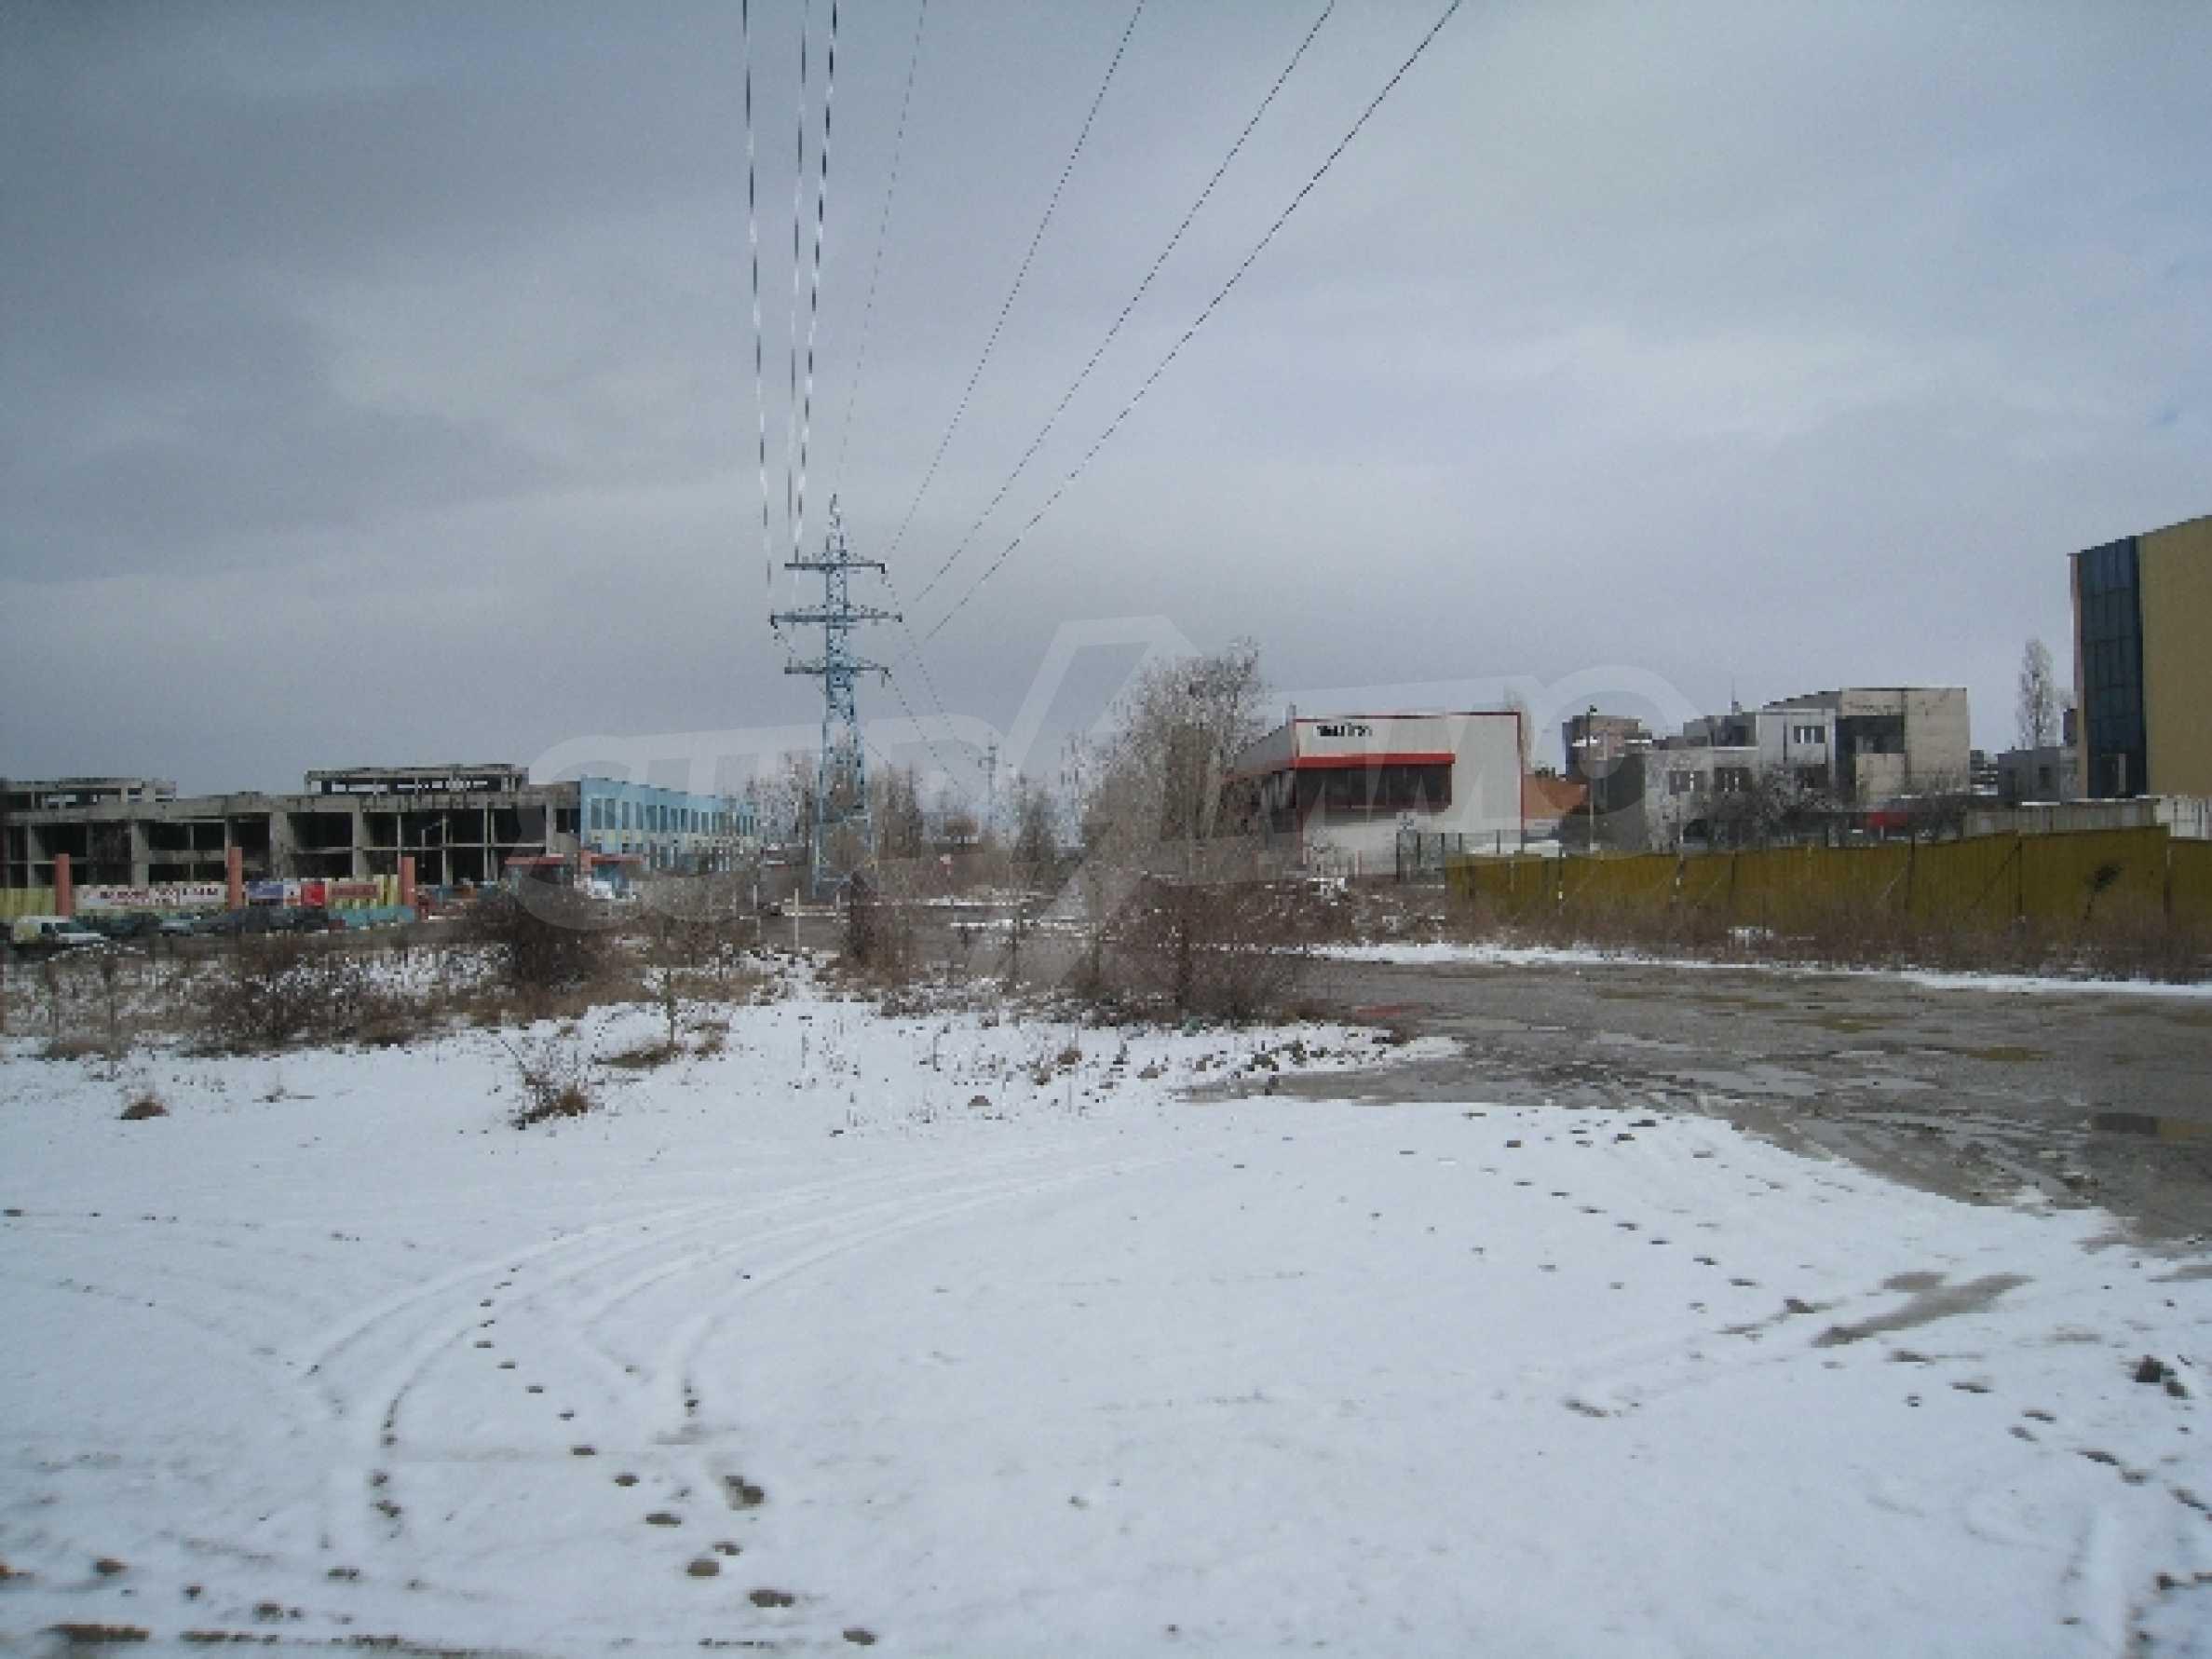 Baugrundstück neben dem Flughafen 7